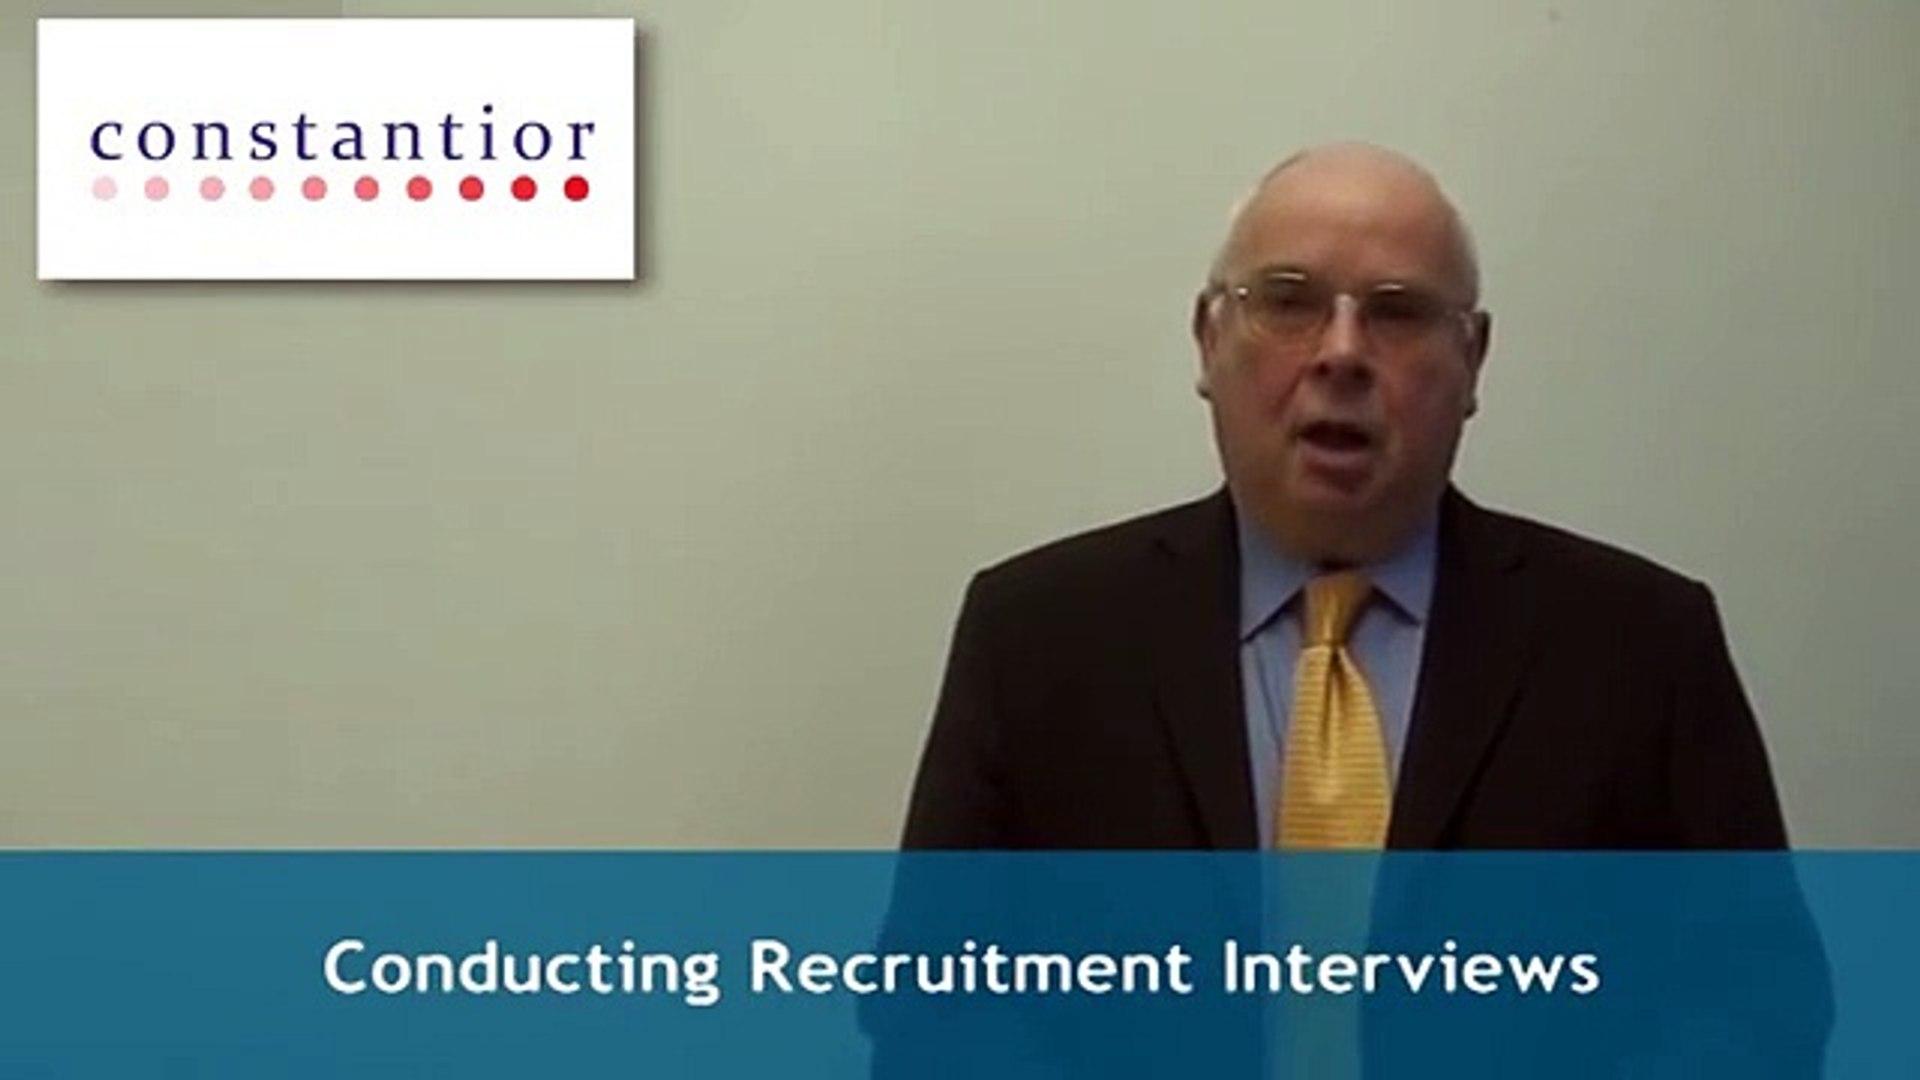 Conducting Recruitment Interviews